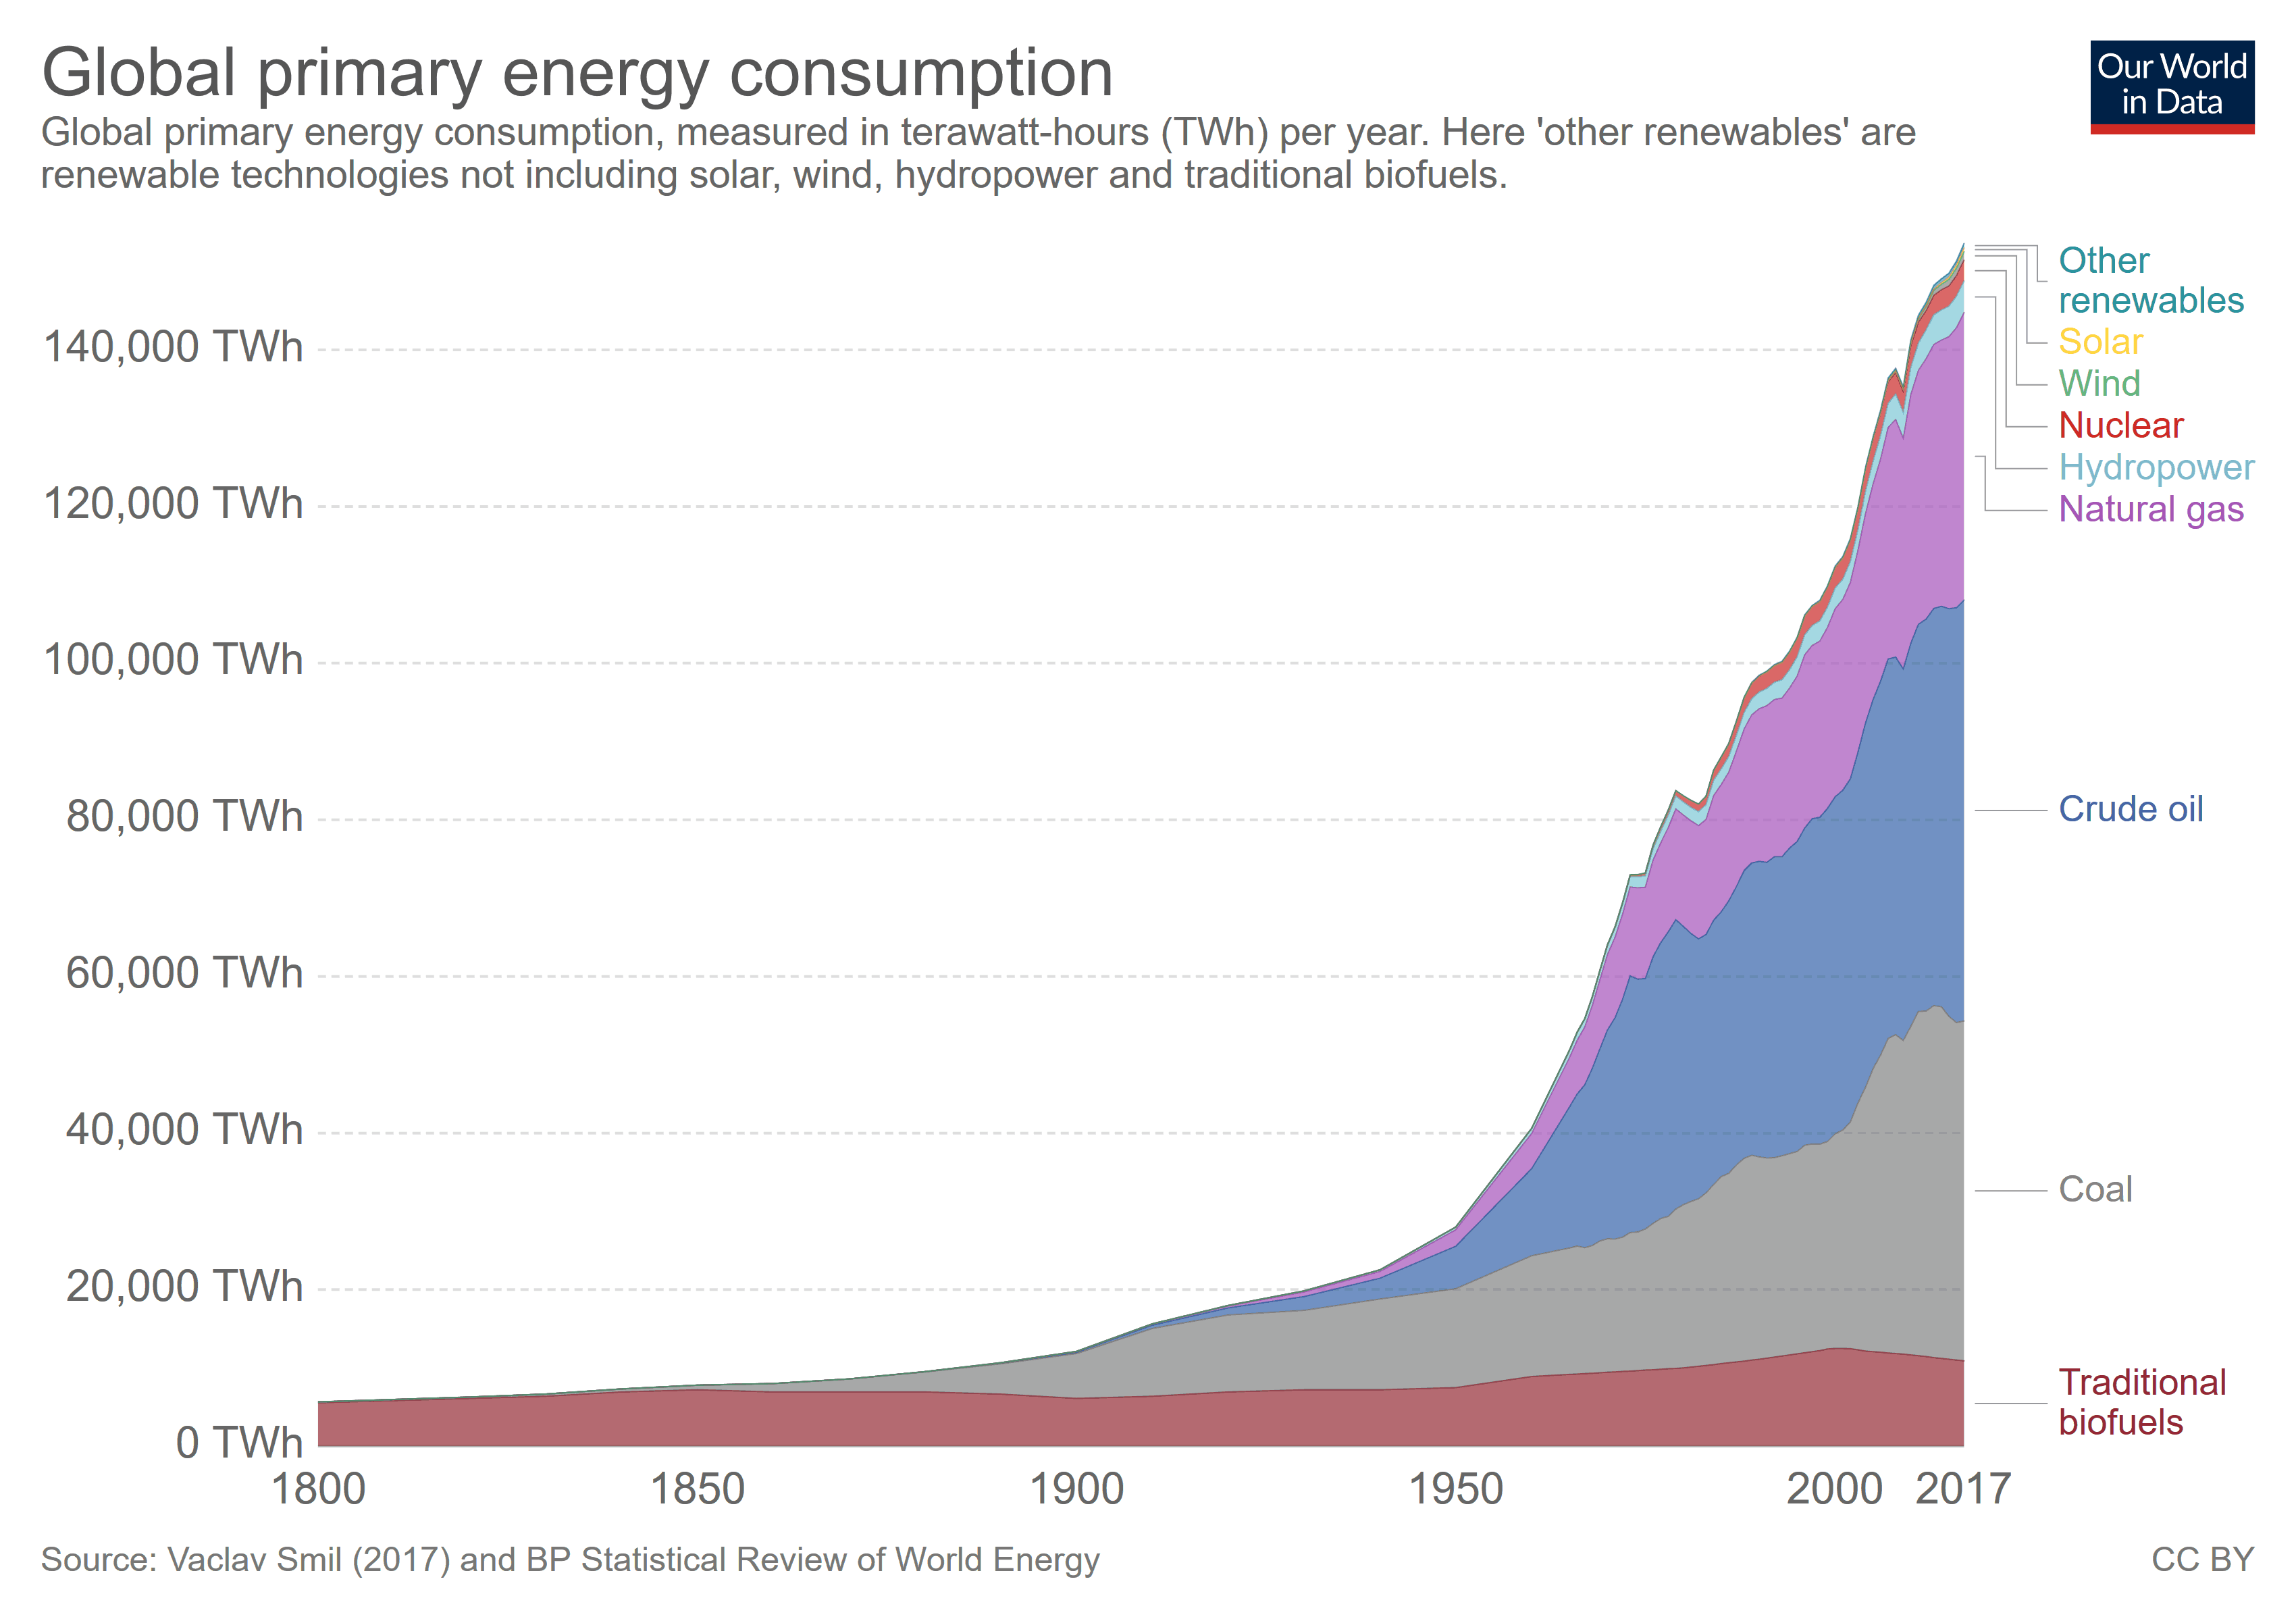 Global primary energy